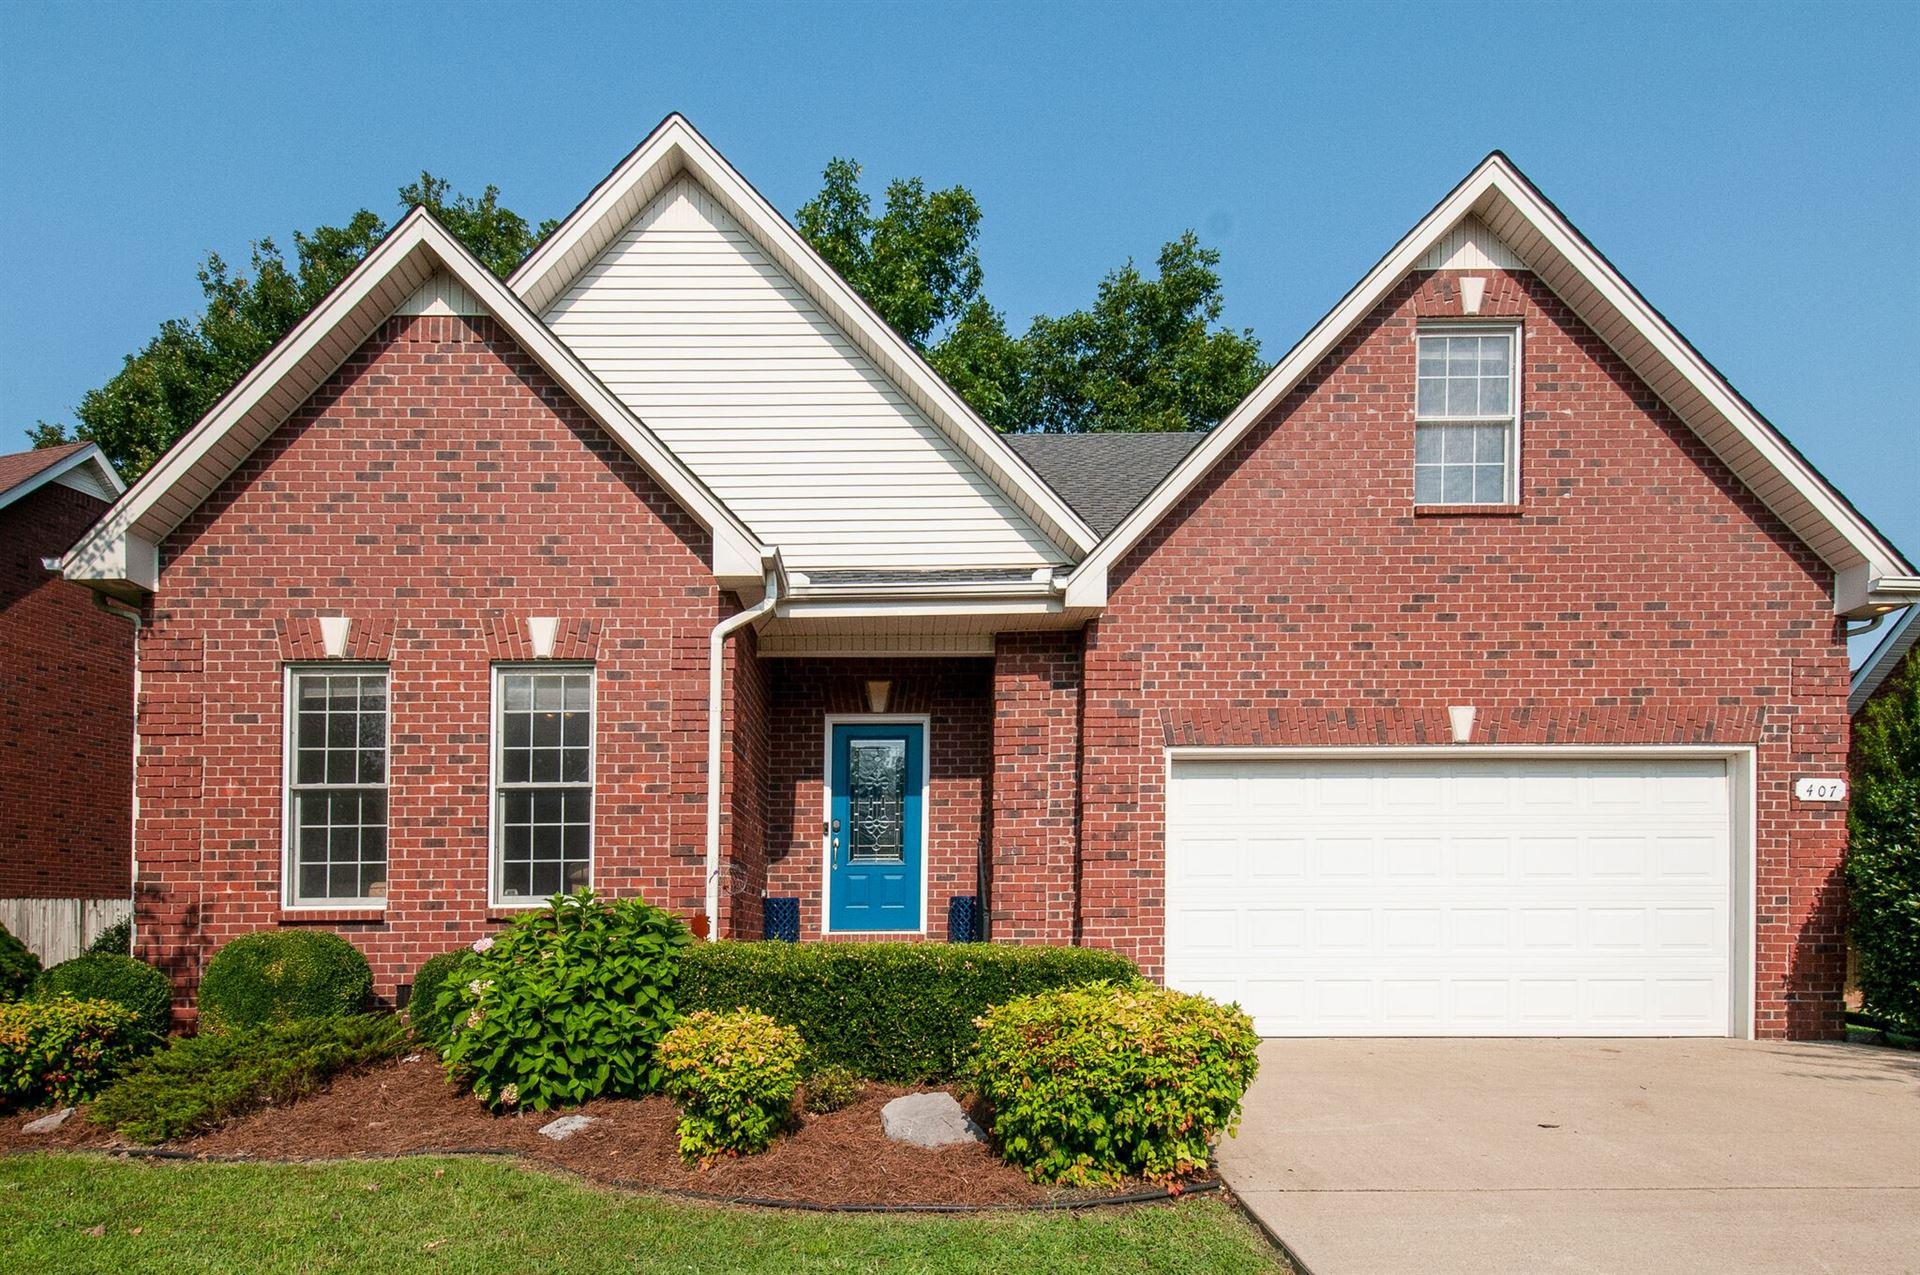 407 Carmel Dr, Murfreesboro, TN 37128 - MLS#: 2275671